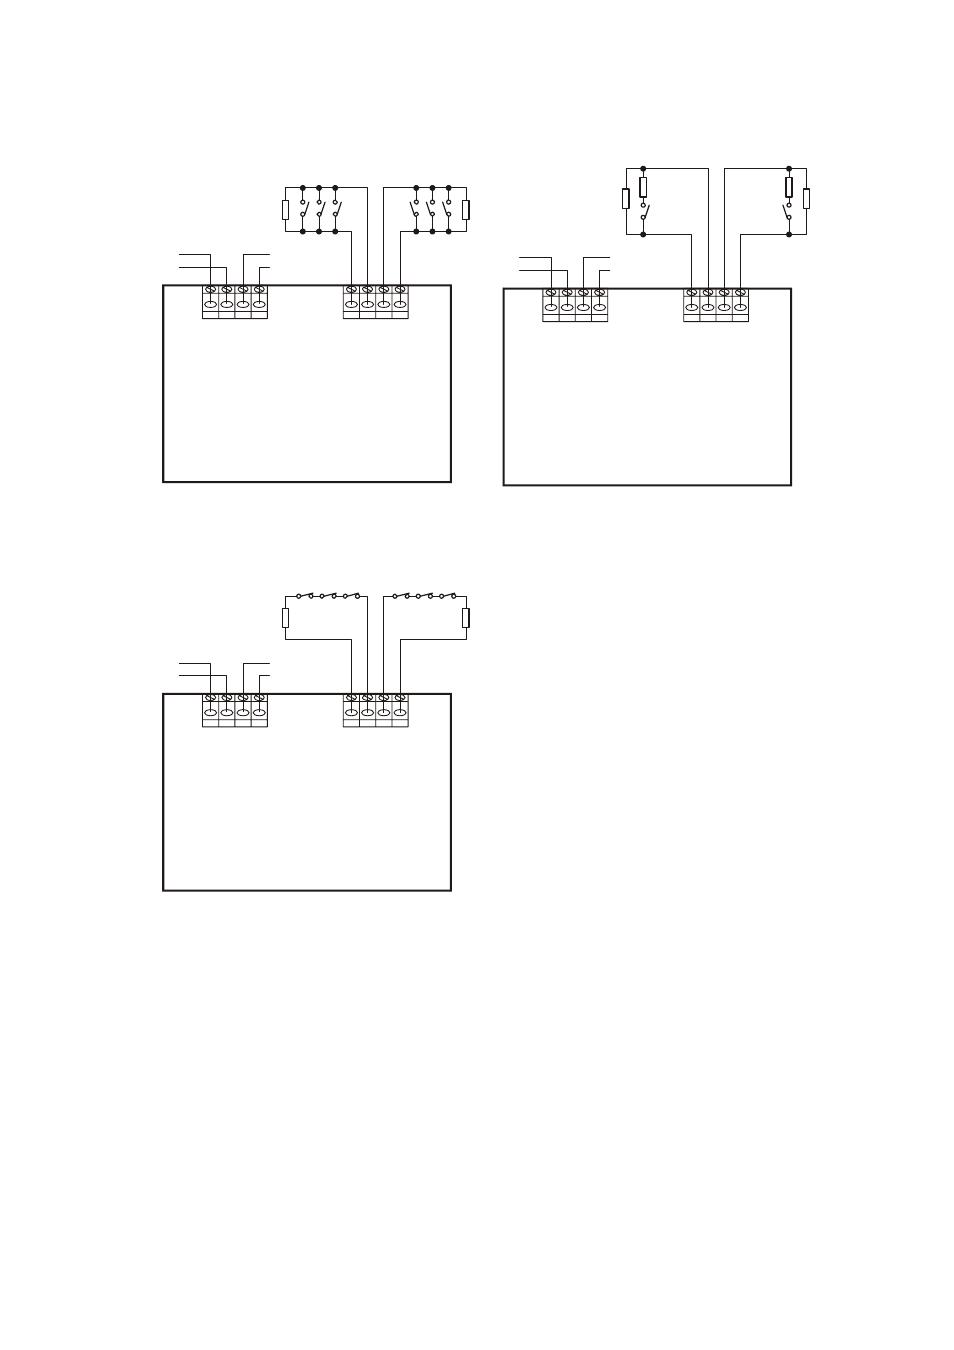 3 field wiring, 4 mx4428 programming options - cim800 | Tyco ... on